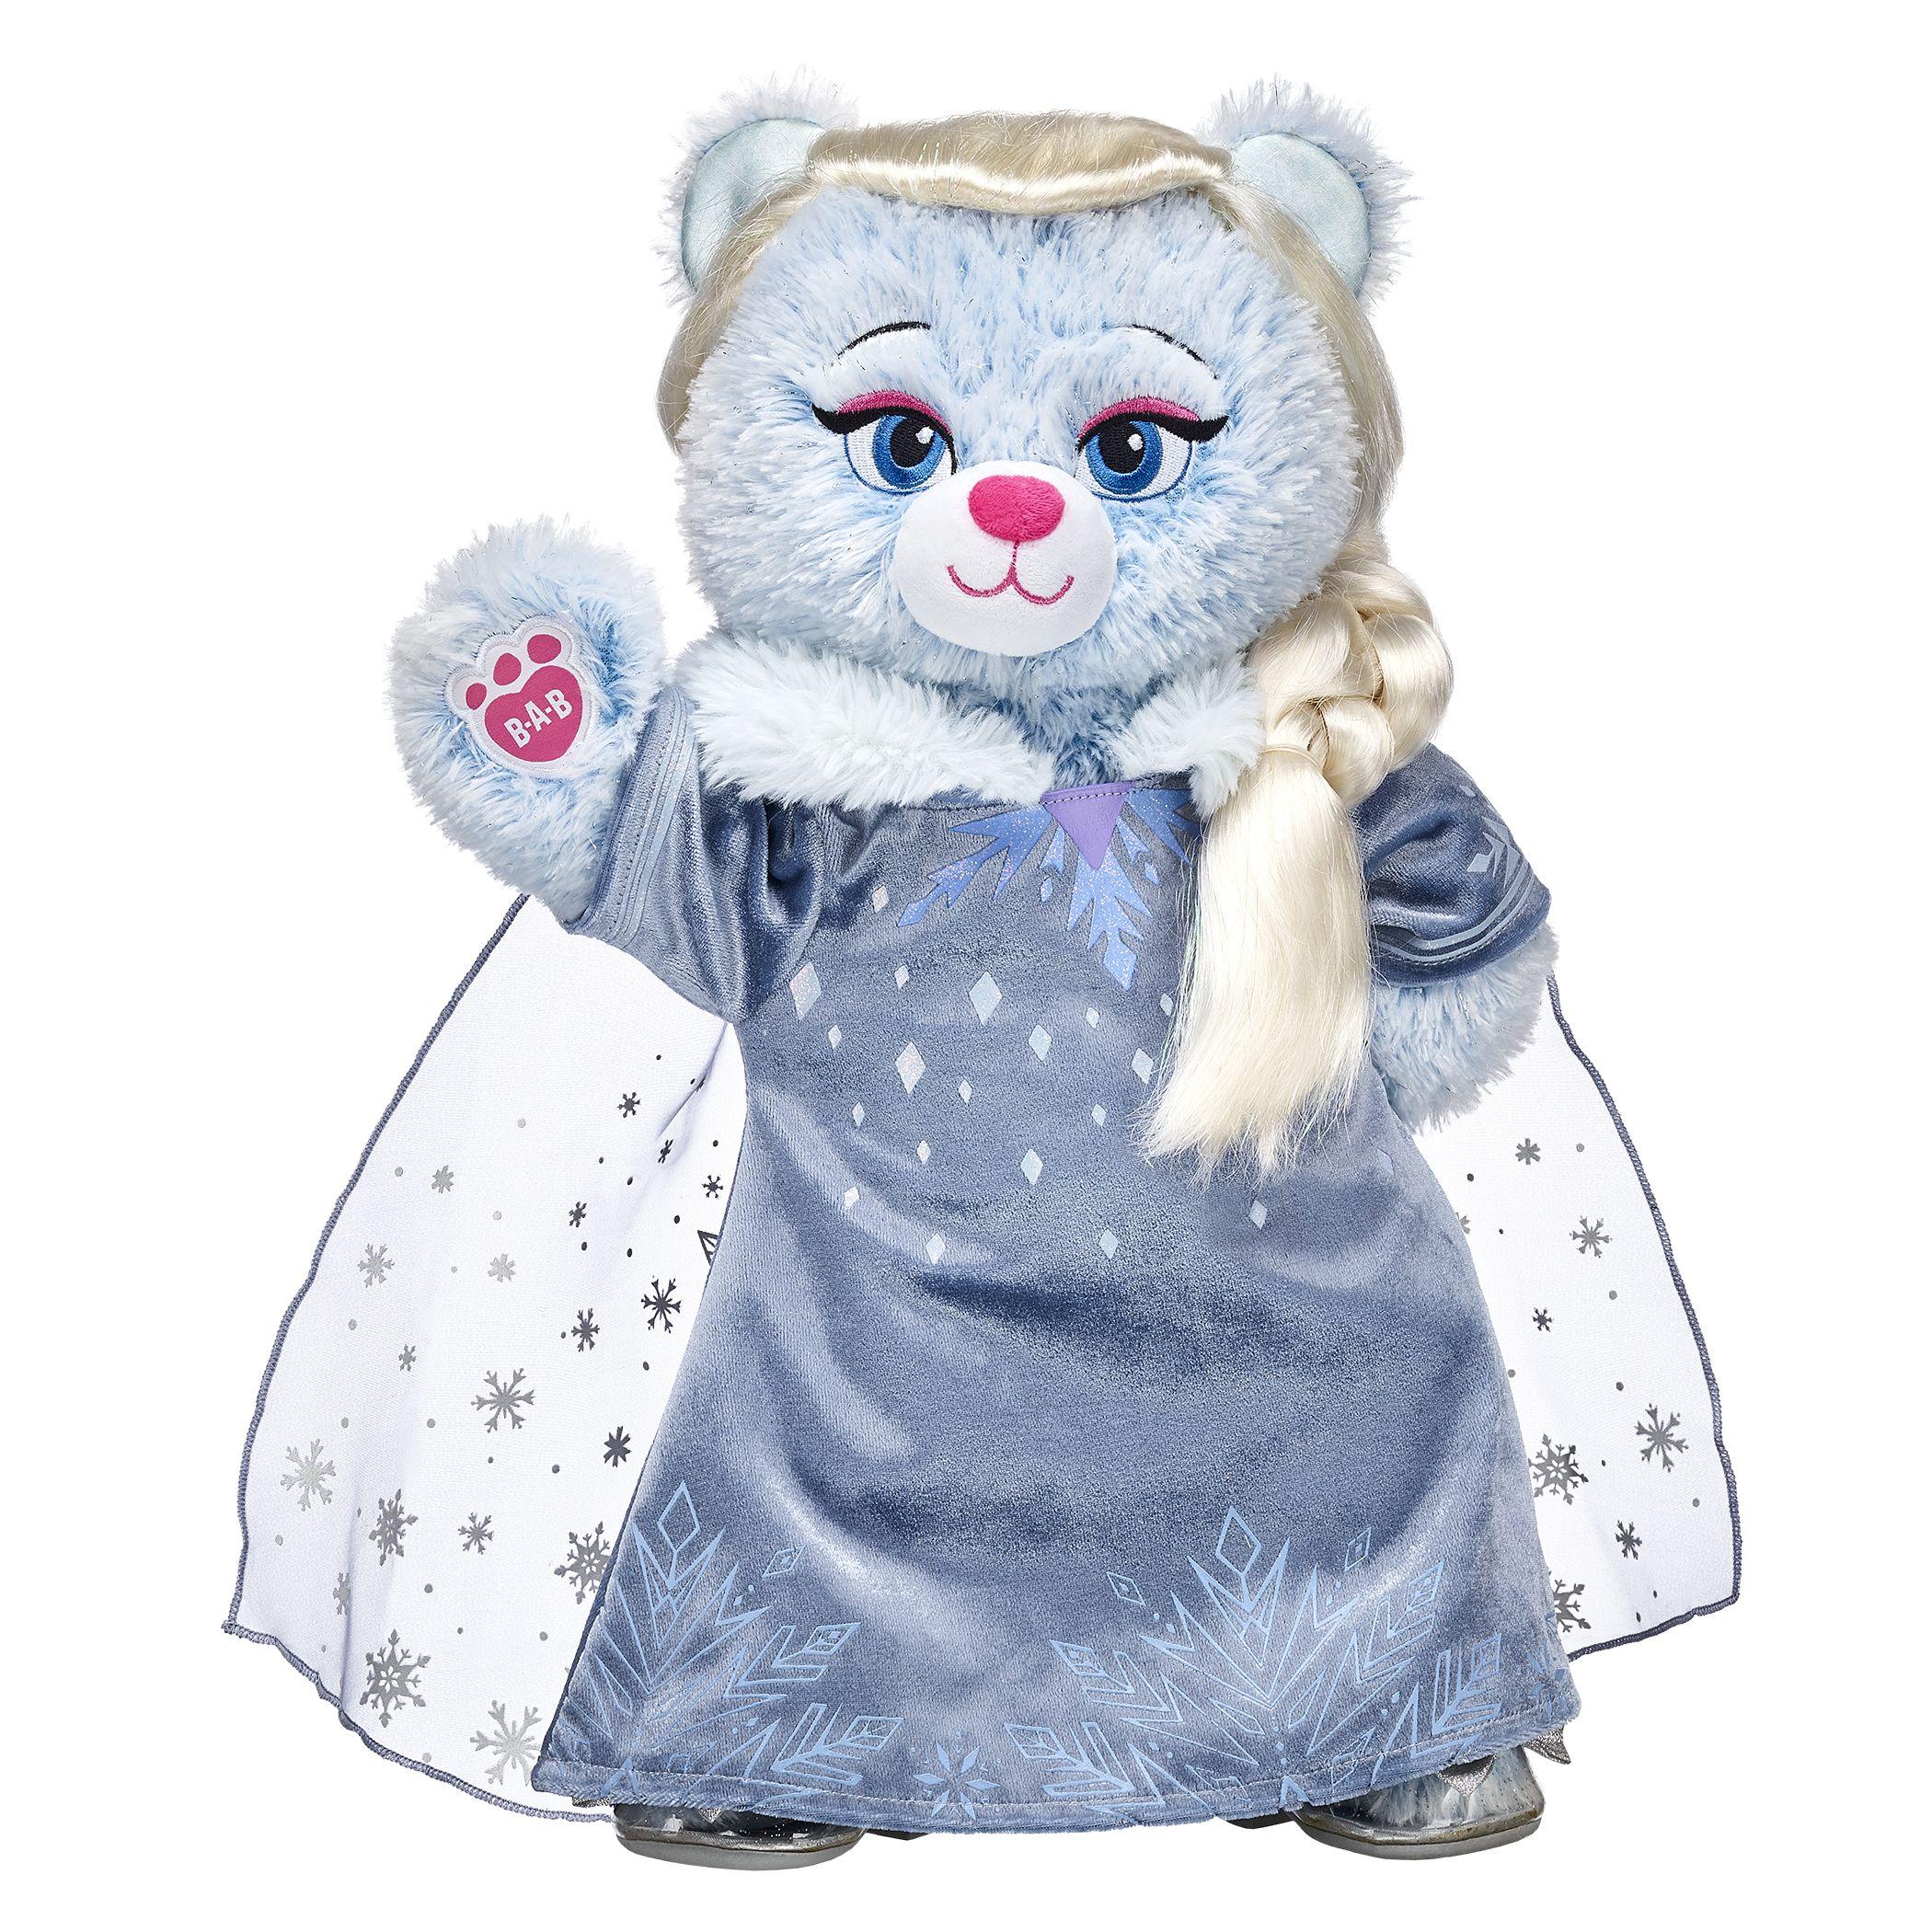 Disney Frozen Elsa Inspired Bear Gift Set Disney Frozen Elsa